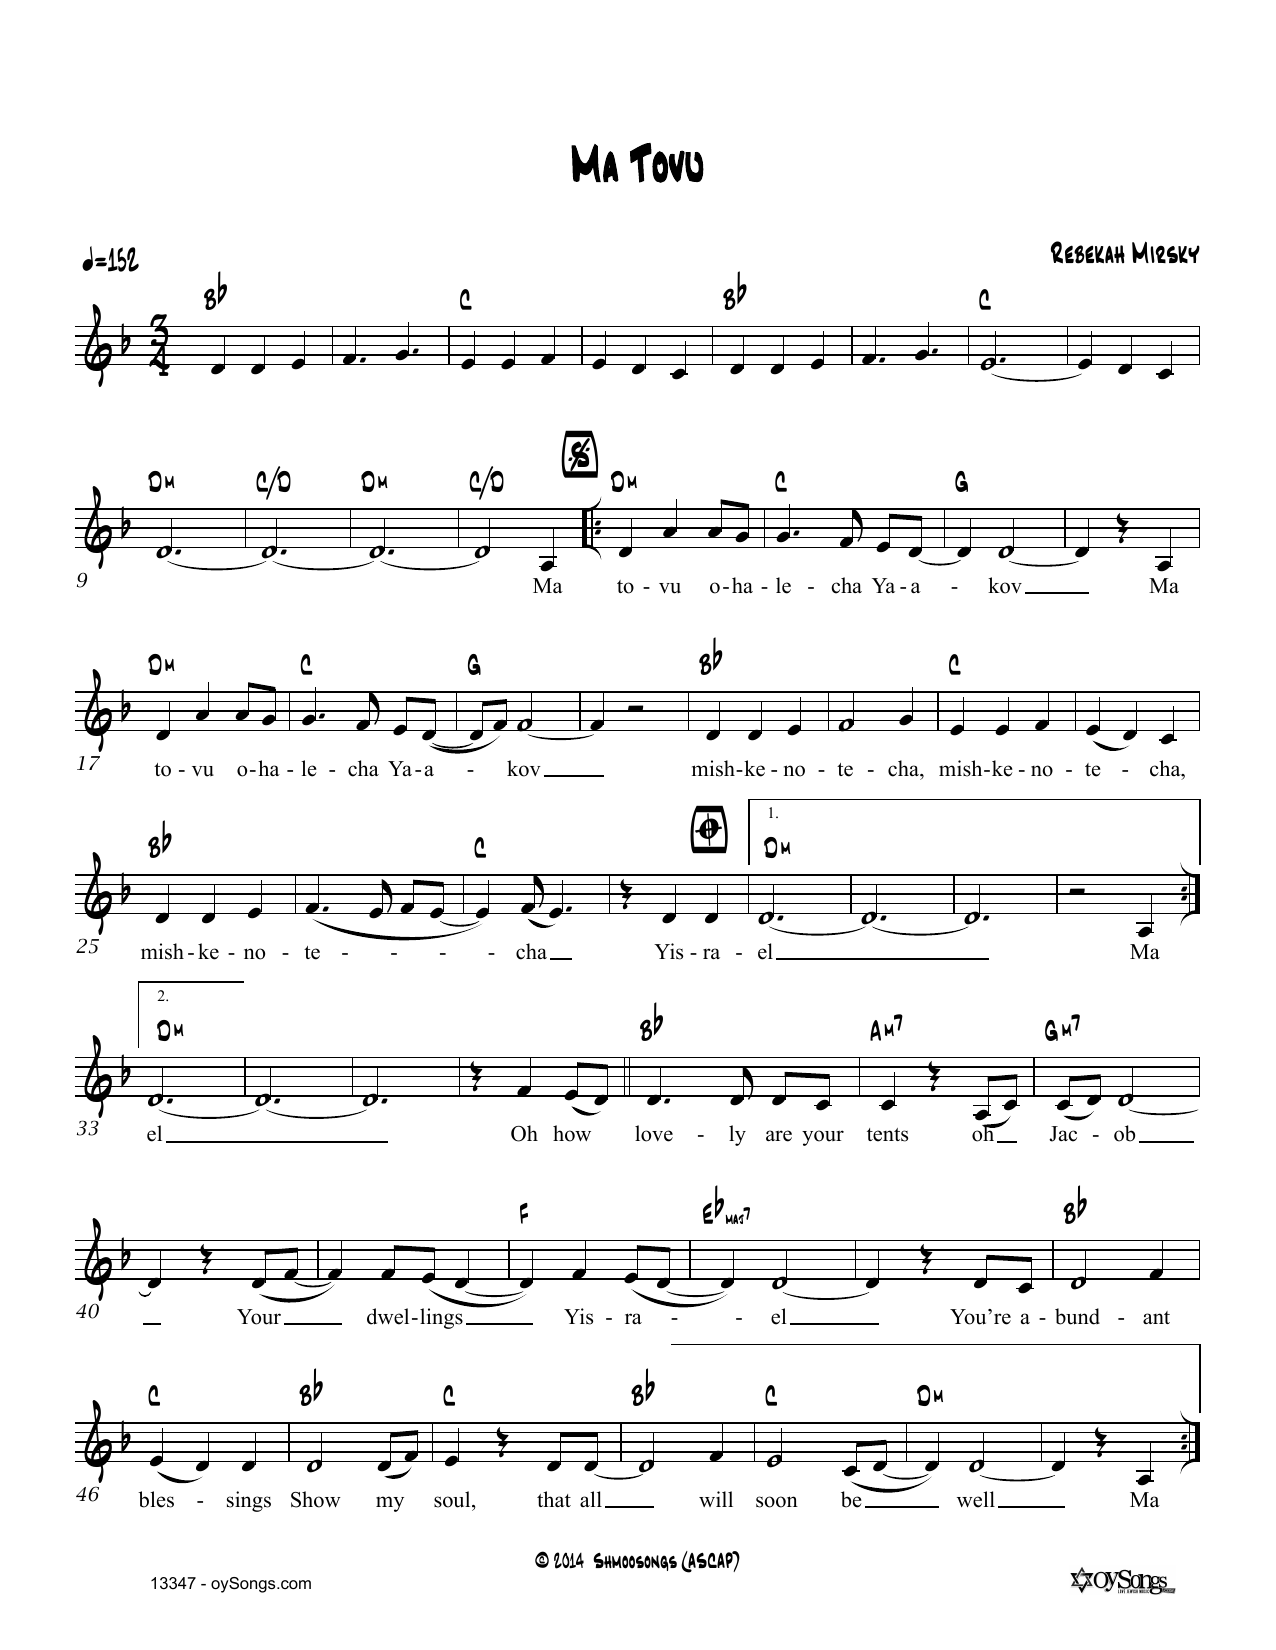 Rebecca Mirsky Ma Tovu sheet music notes and chords. Download Printable PDF.